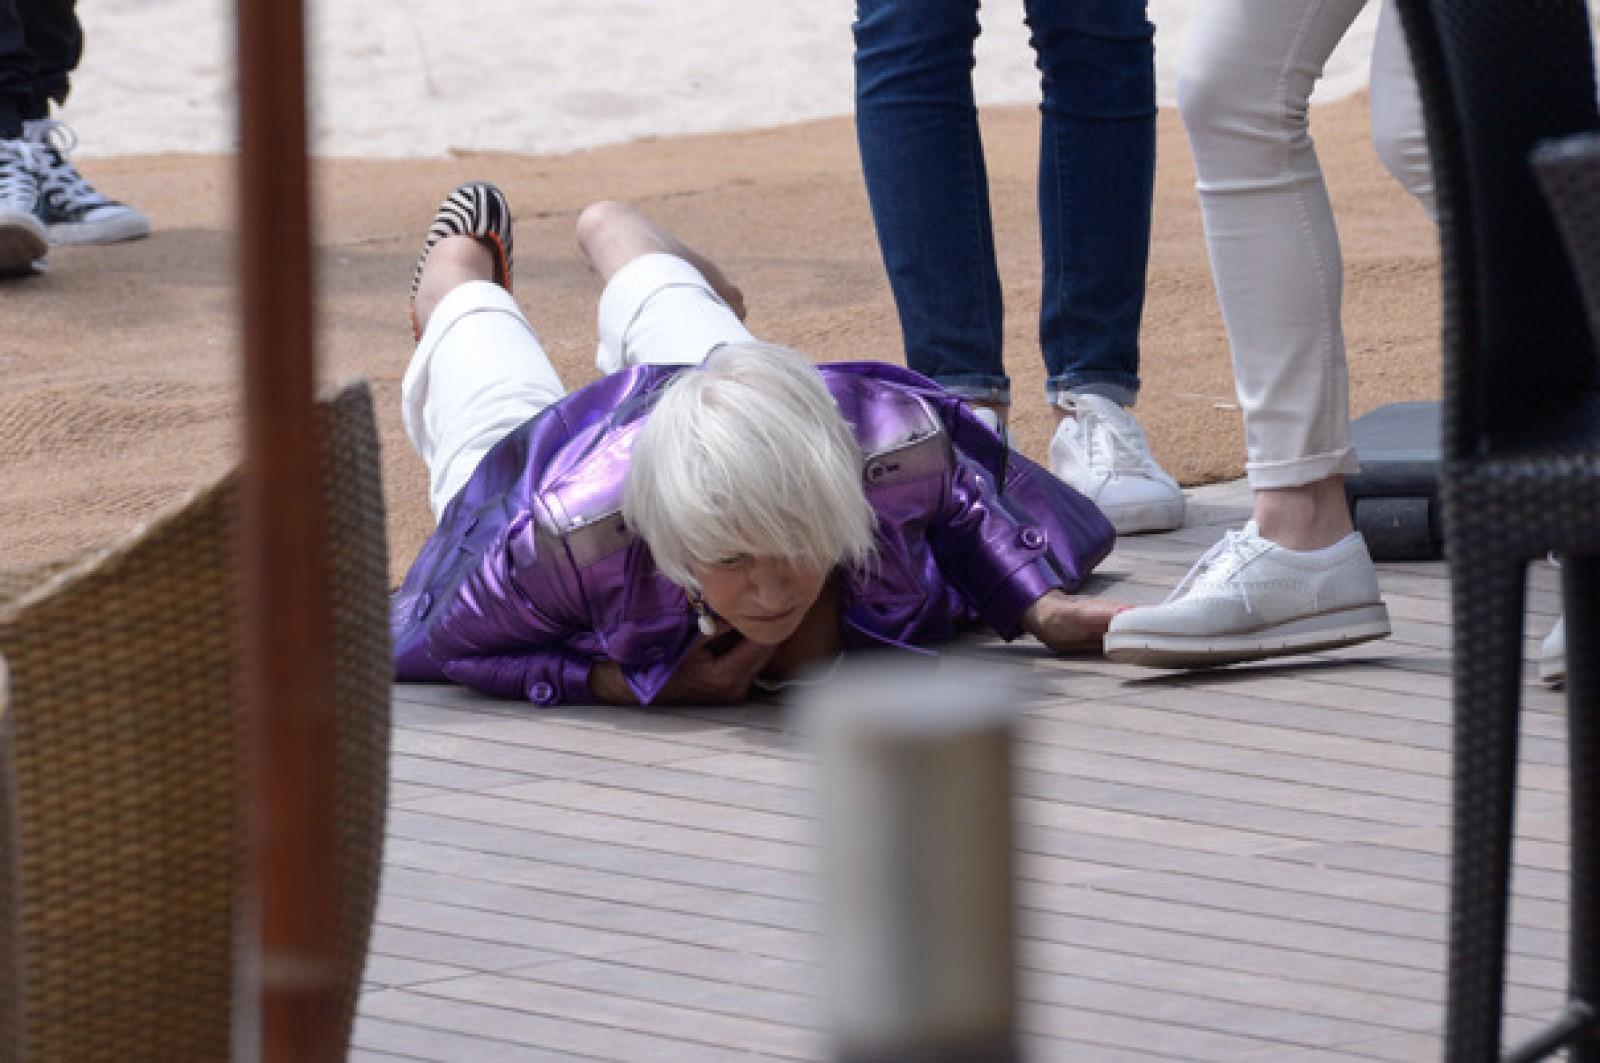 (foto) Actrița Helen Mirren a căzut la finalul unui interviu acordat la Cannes